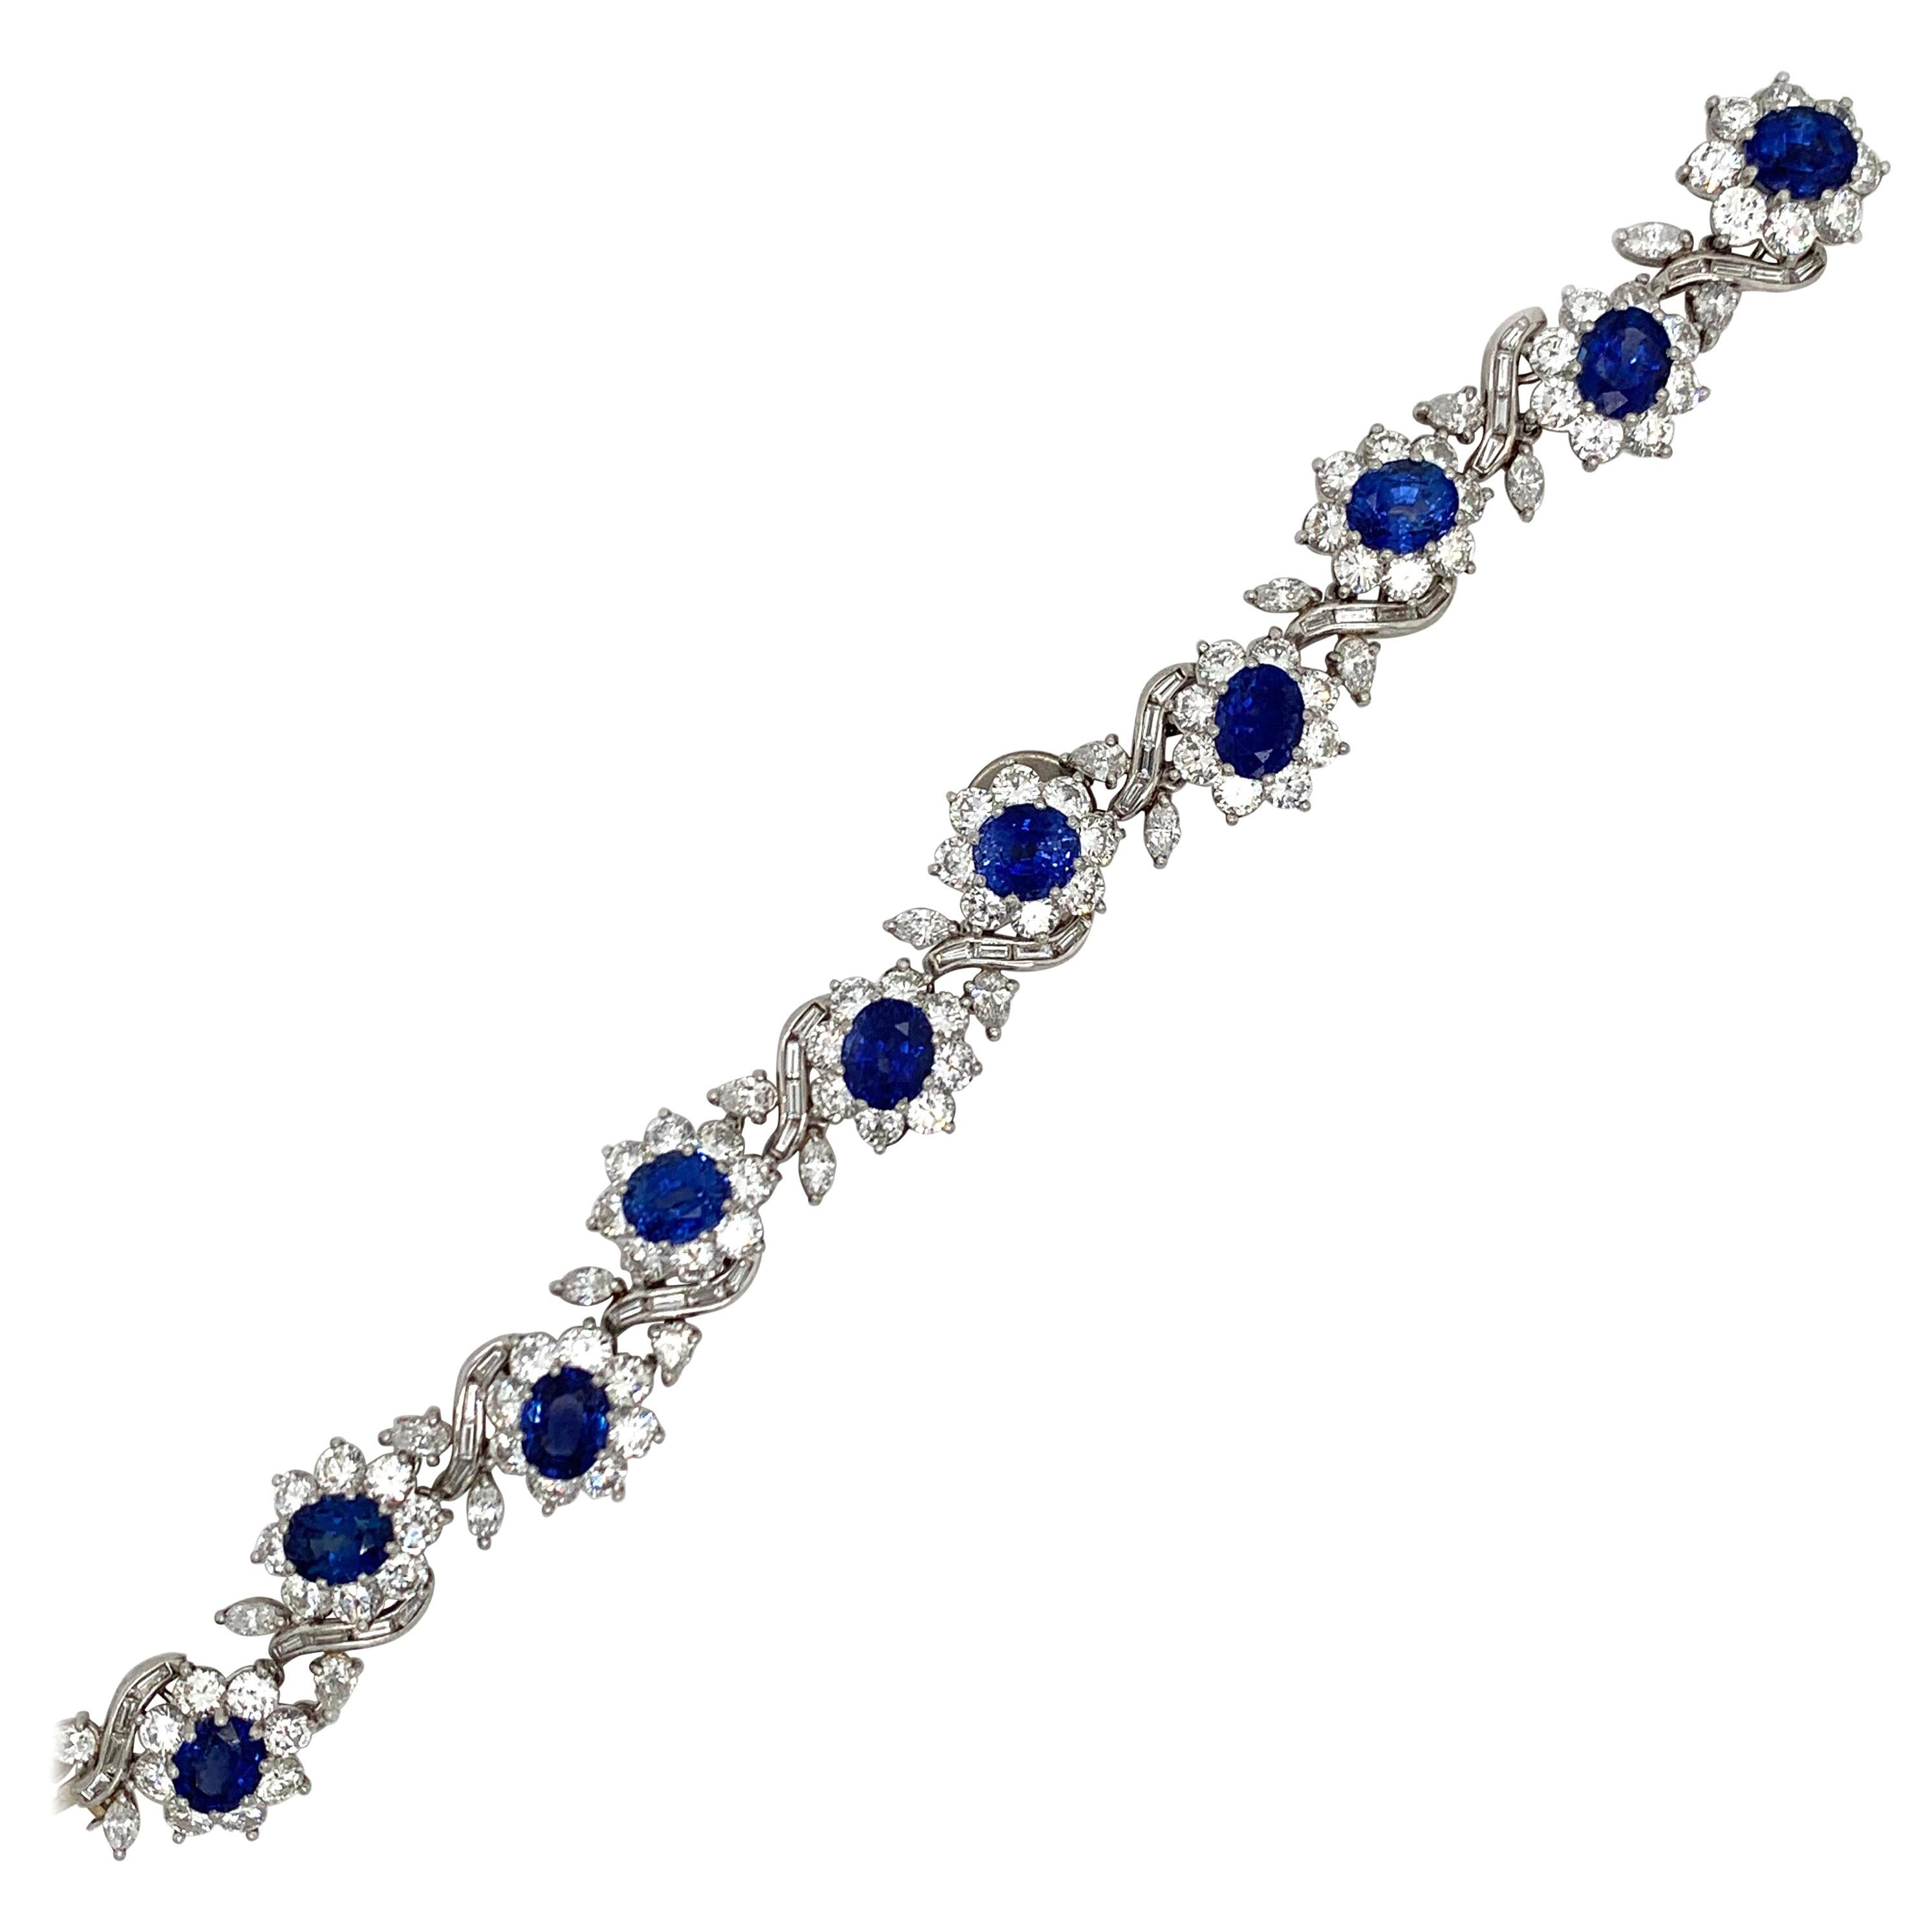 Platinum 21.23 Carat Sapphire Diamond Bracelet